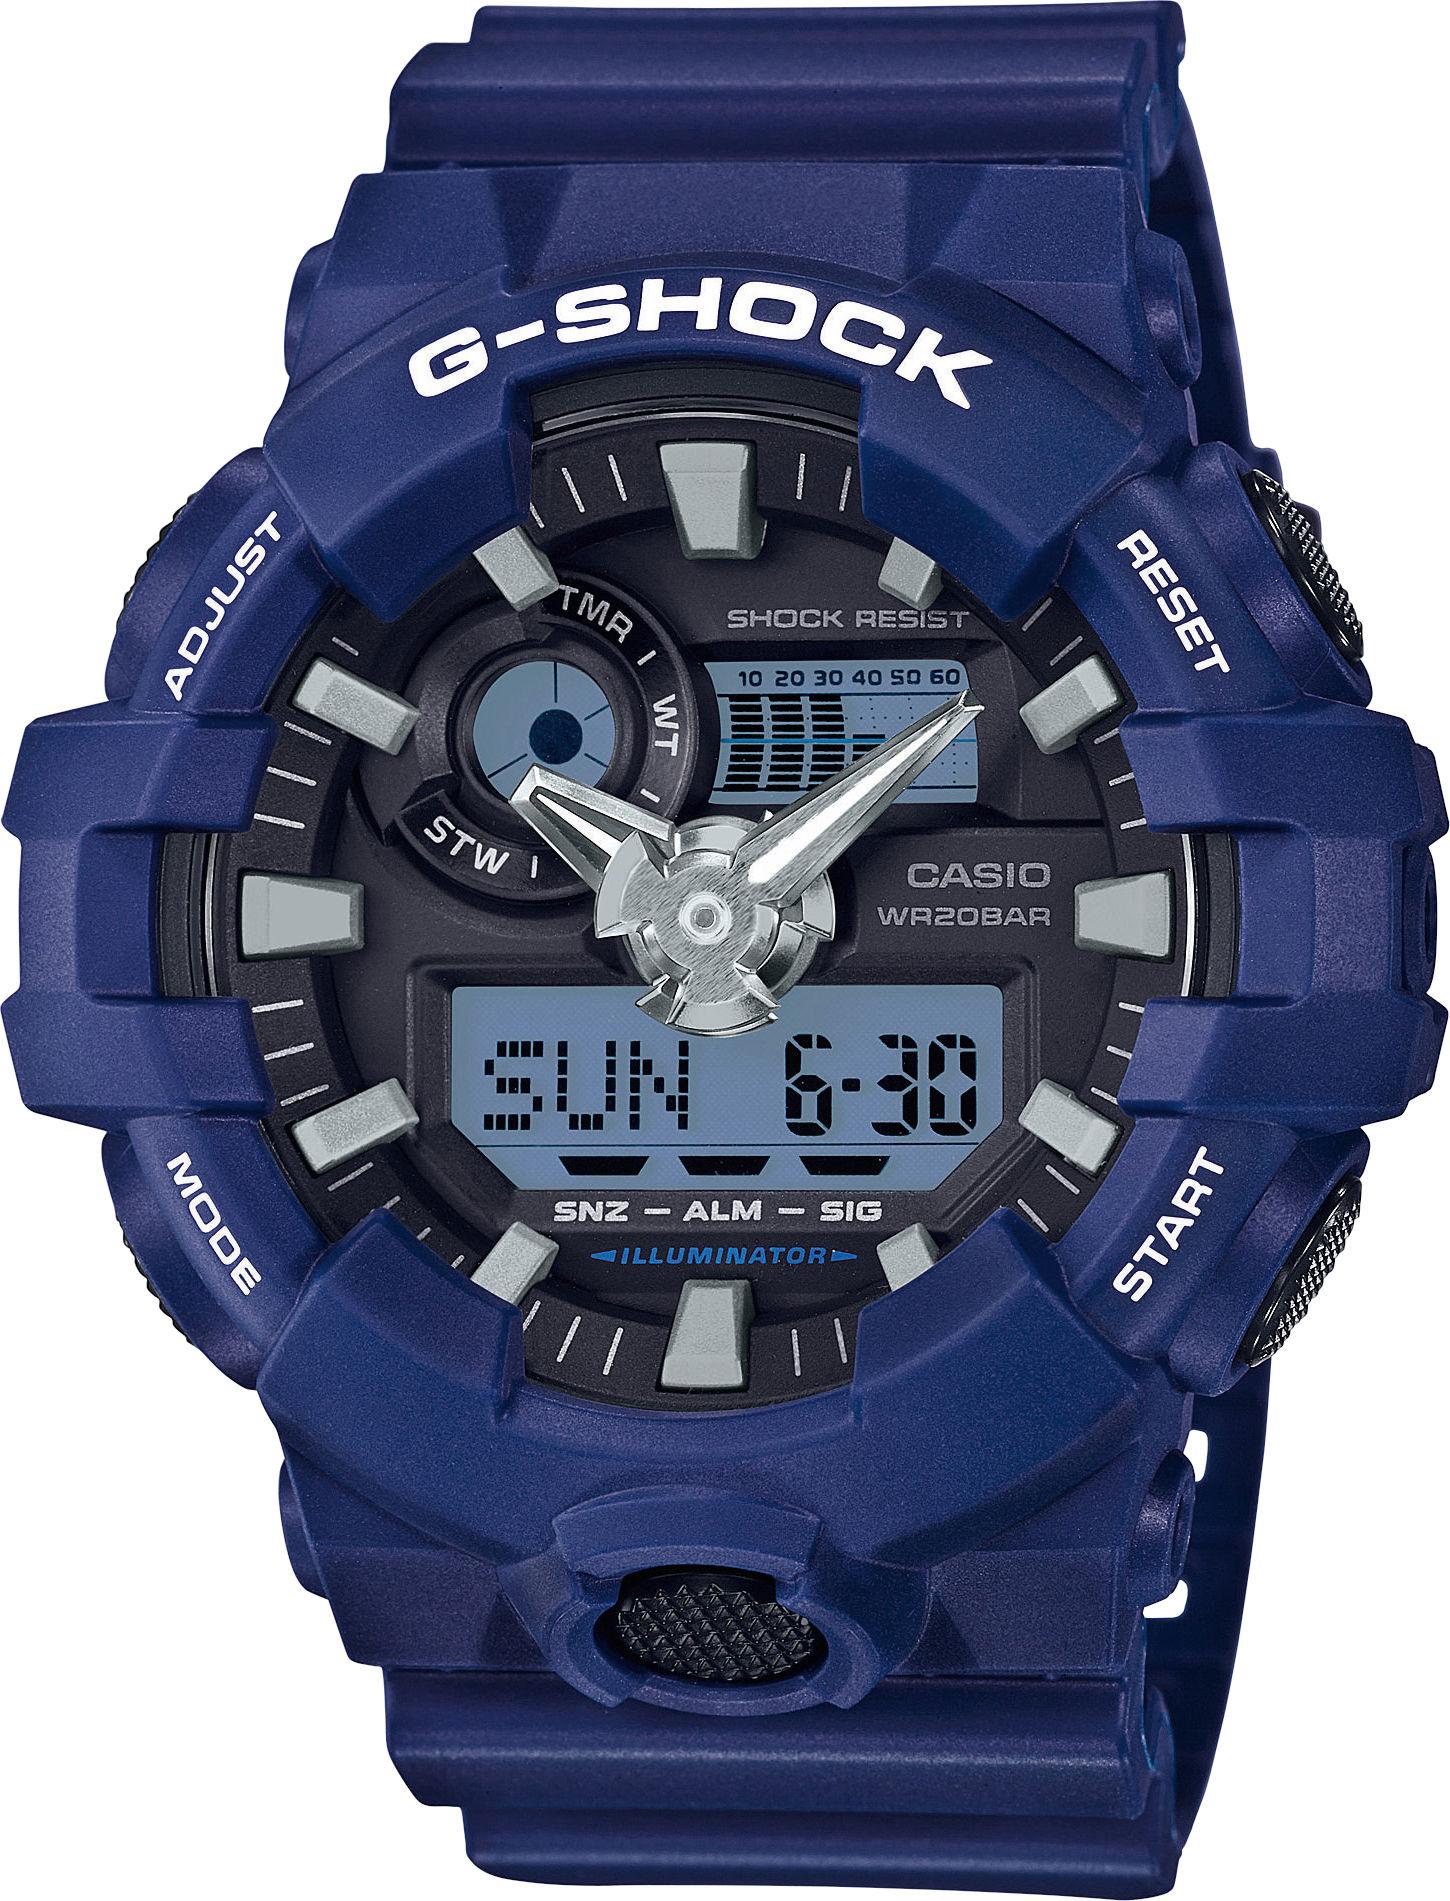 Casio g shock ga 110dc 2a - Cochces.cz 3fbe2c9952d